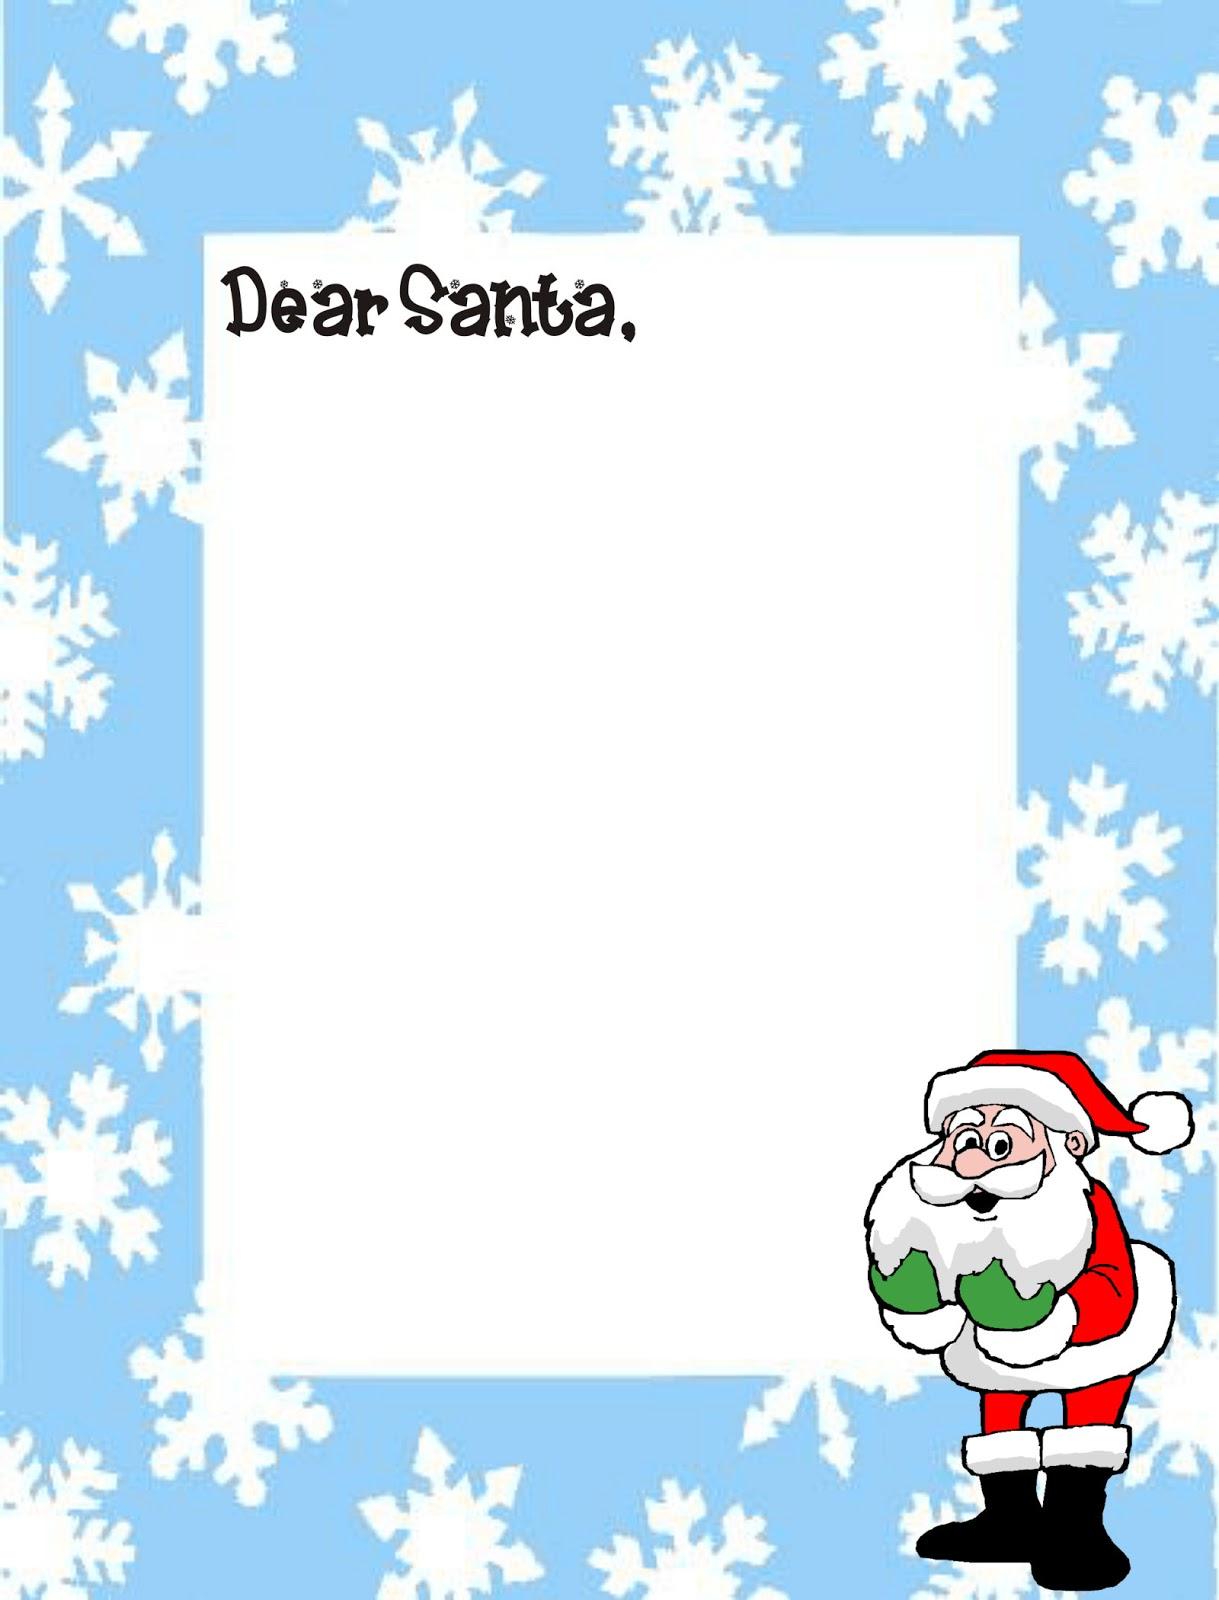 DEAR%2BSANTA%2BLETTER%2BTEMPLATE Colorable Letter To Santa Templates Printable on